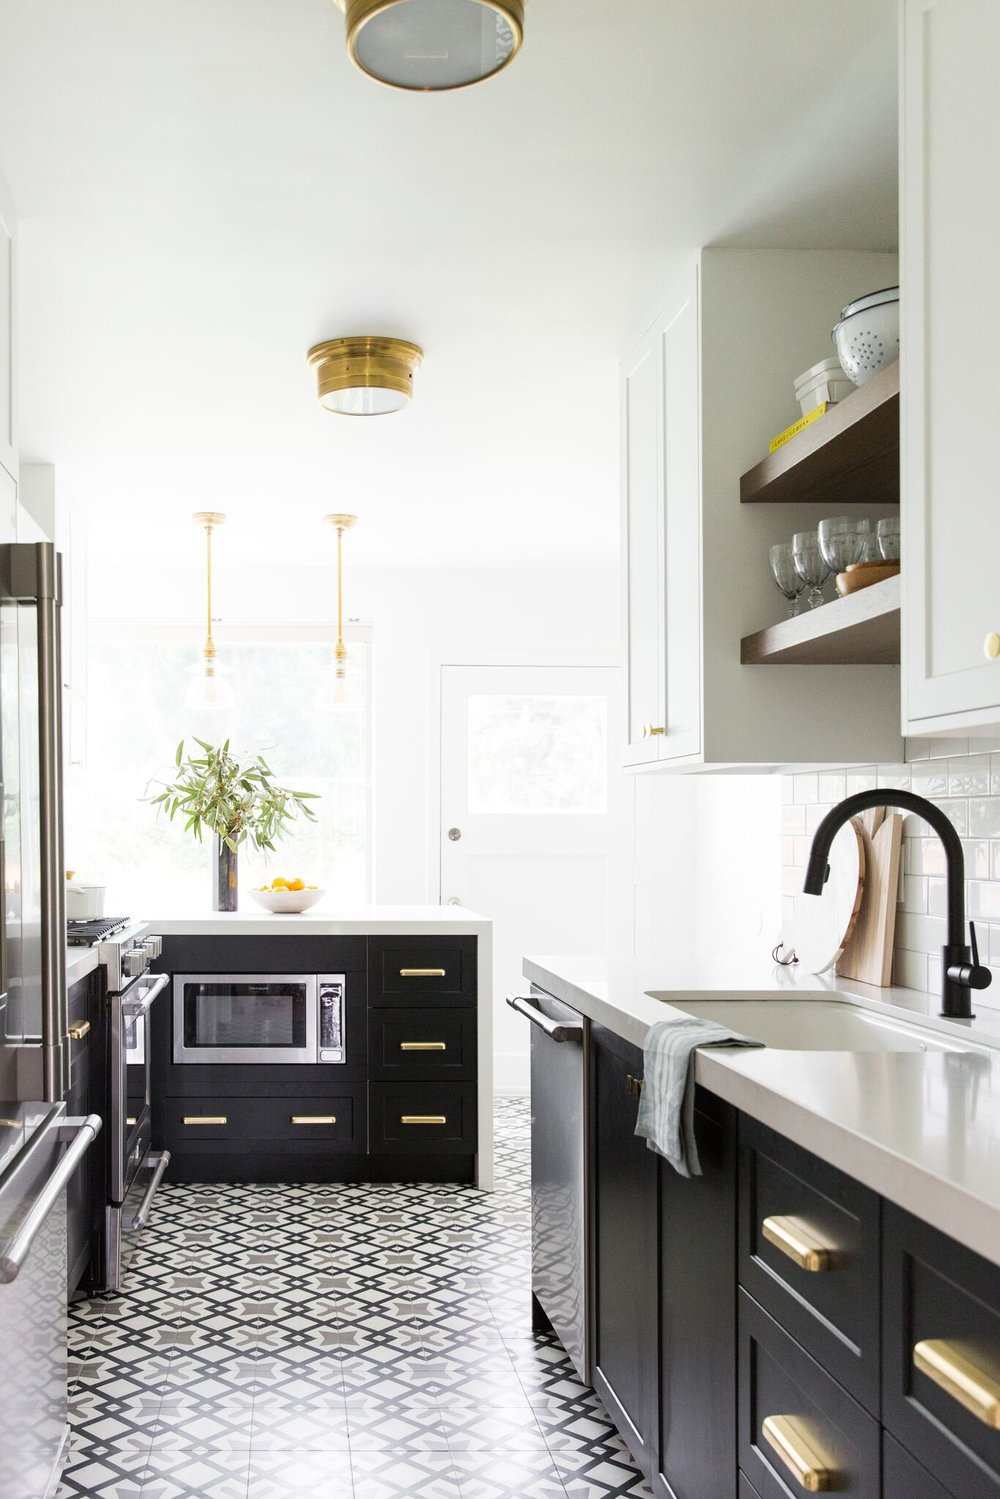 Hillside Kitchen Remodel